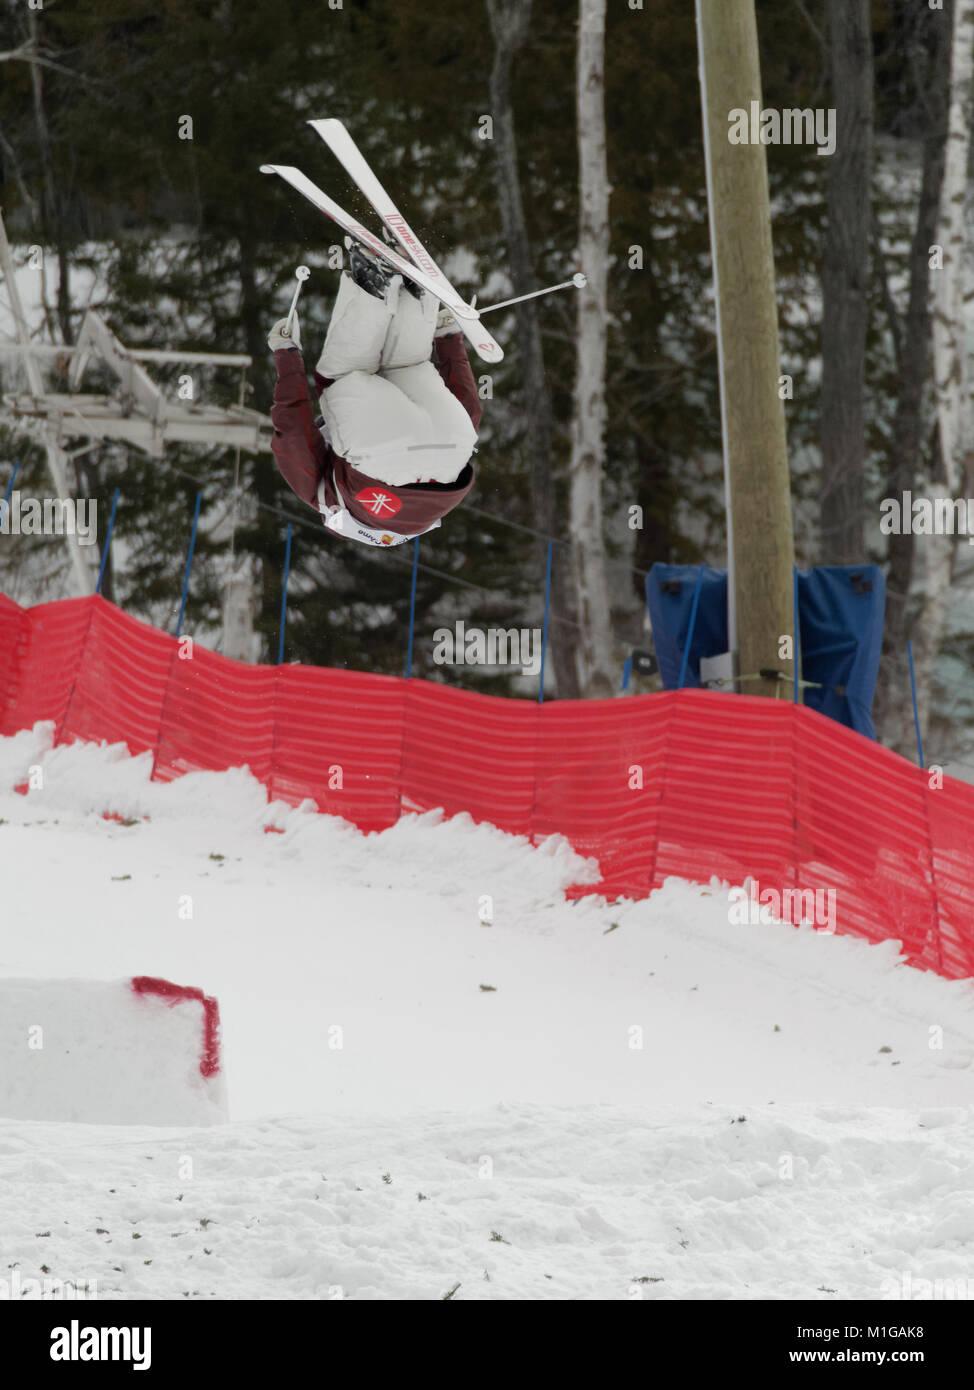 Val Saint-Come,Canada 1/27/2018. Alex-Anne Gagnon of Canada competes at the 2018 NorAm Moguls Championship - Stock Image